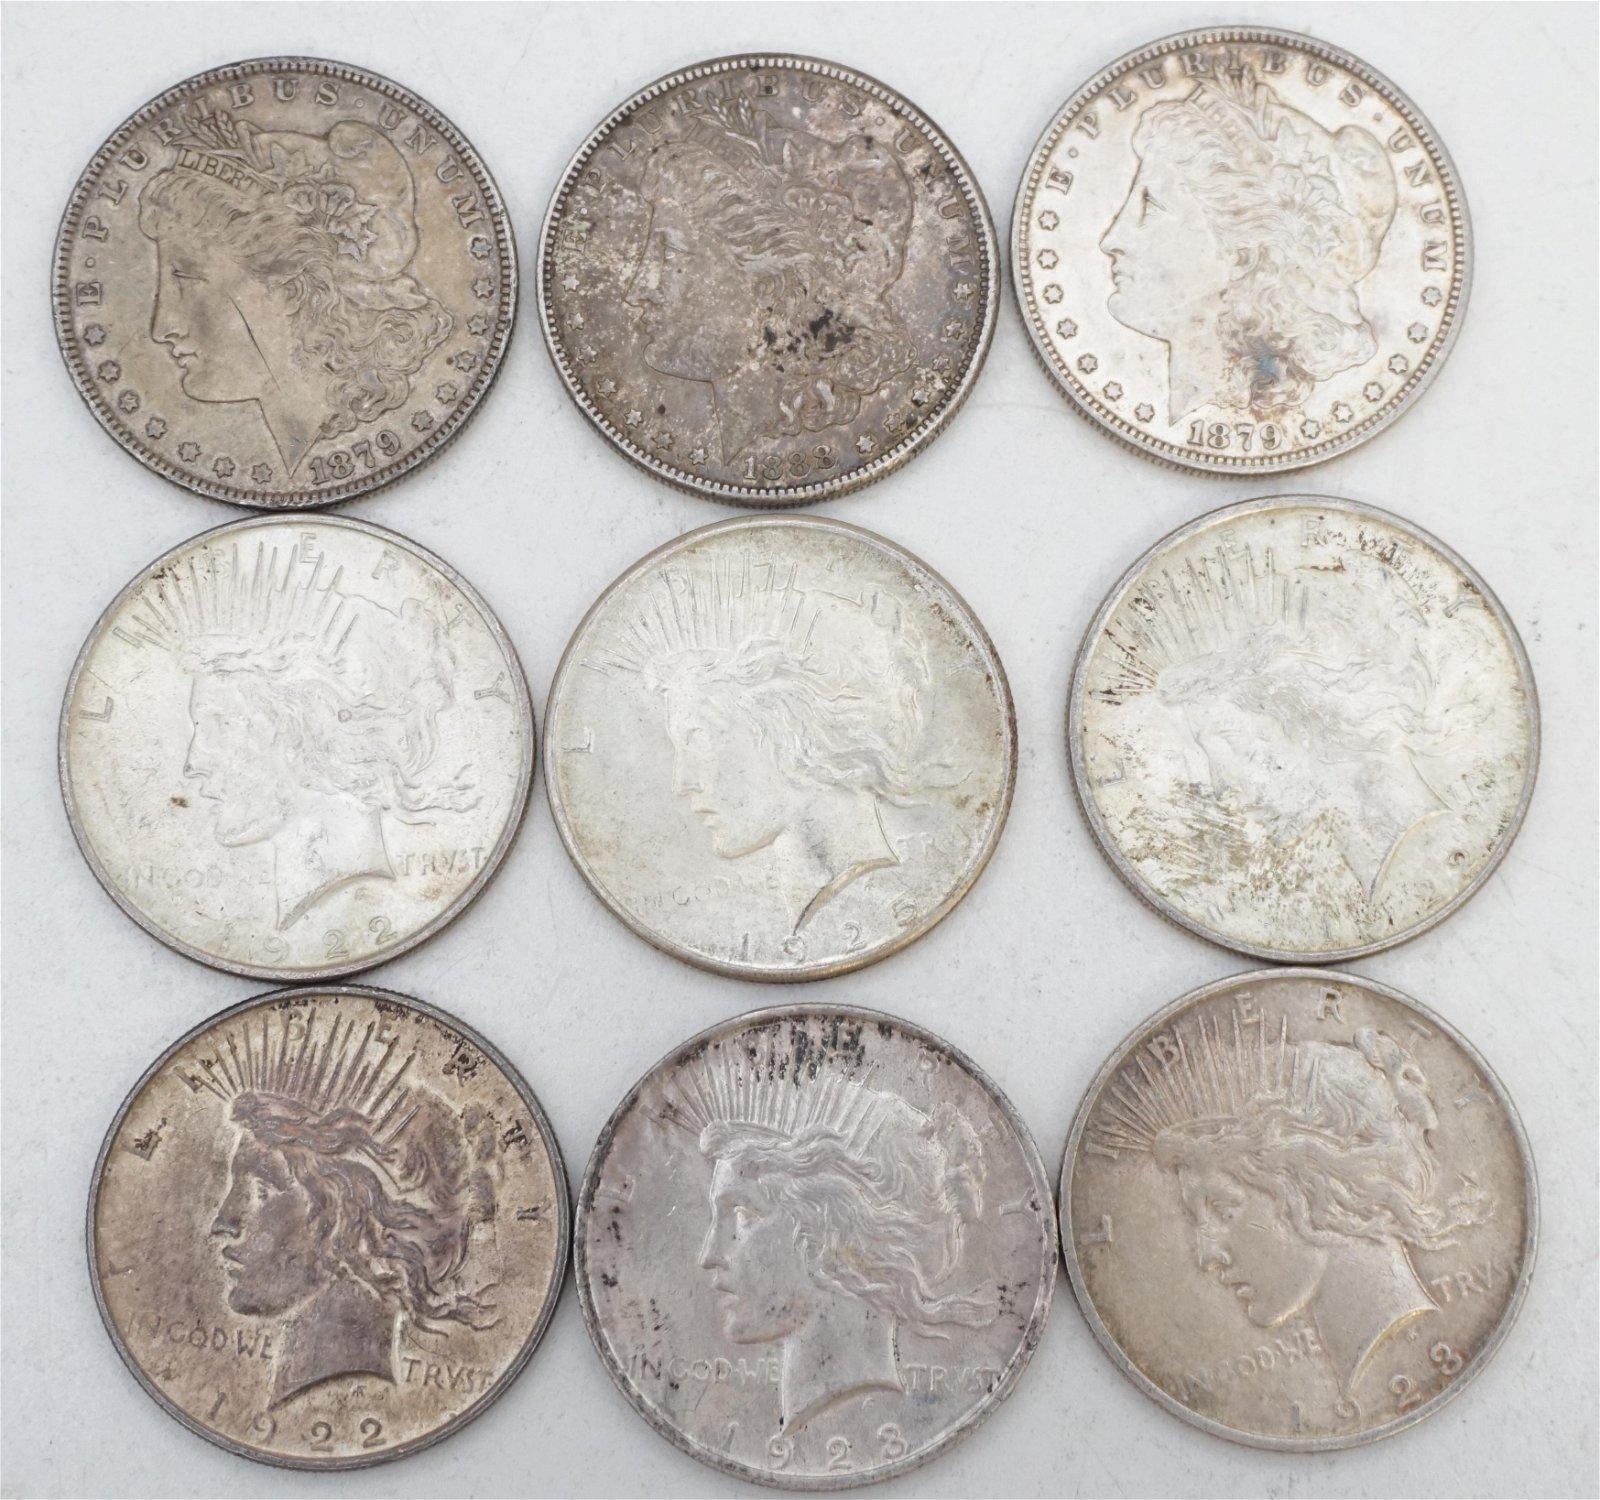 9 MORGAN SILVER DOLLARS